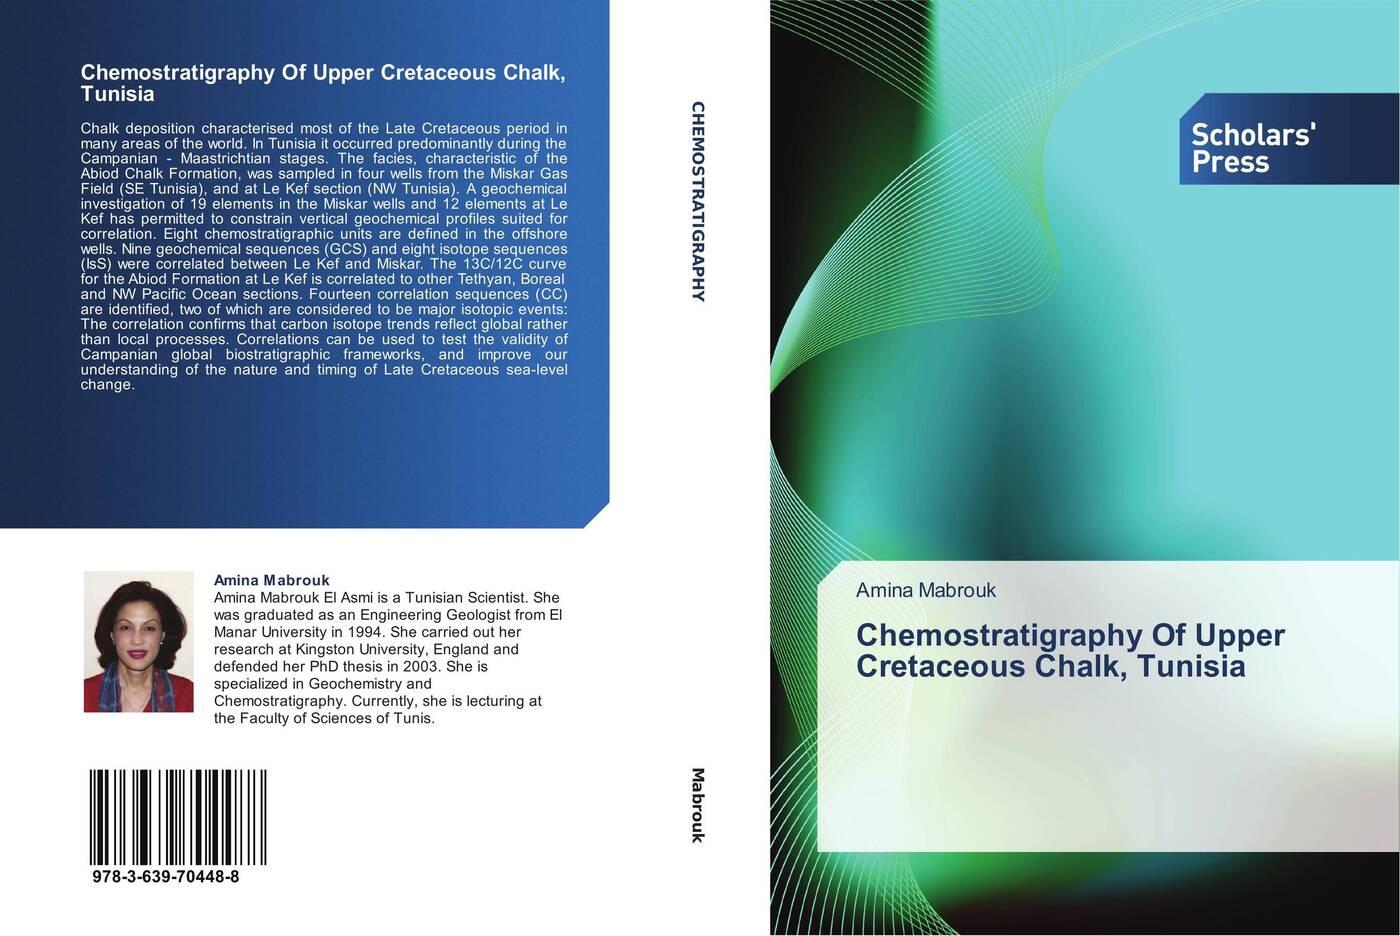 Amina Mabrouk Chemostratigraphy Of Upper Cretaceous Chalk, Tunisia все цены